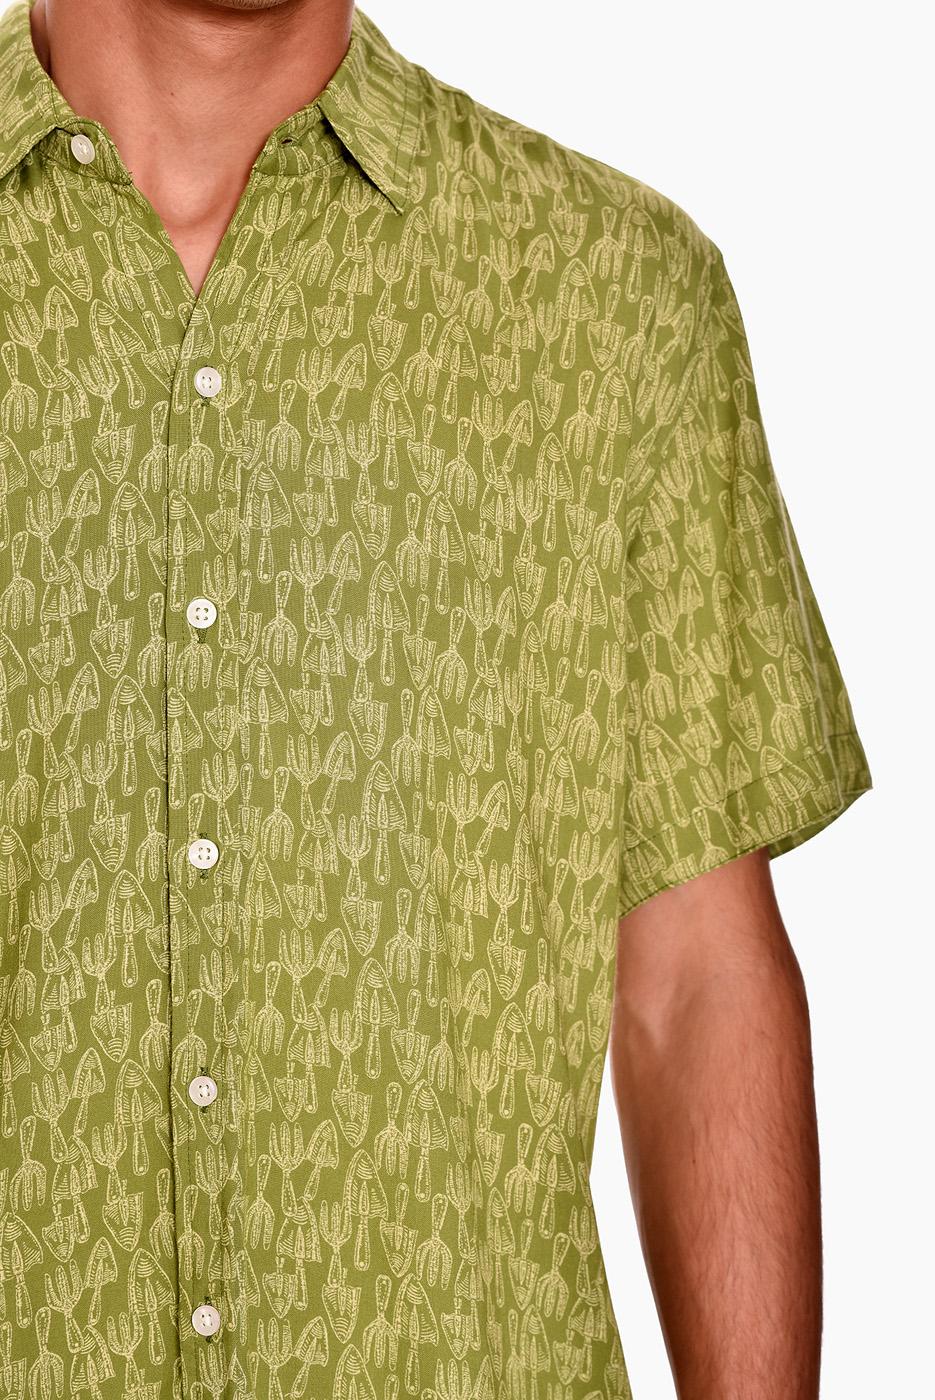 camisa-manga-corta-estampado-rock-vegeta